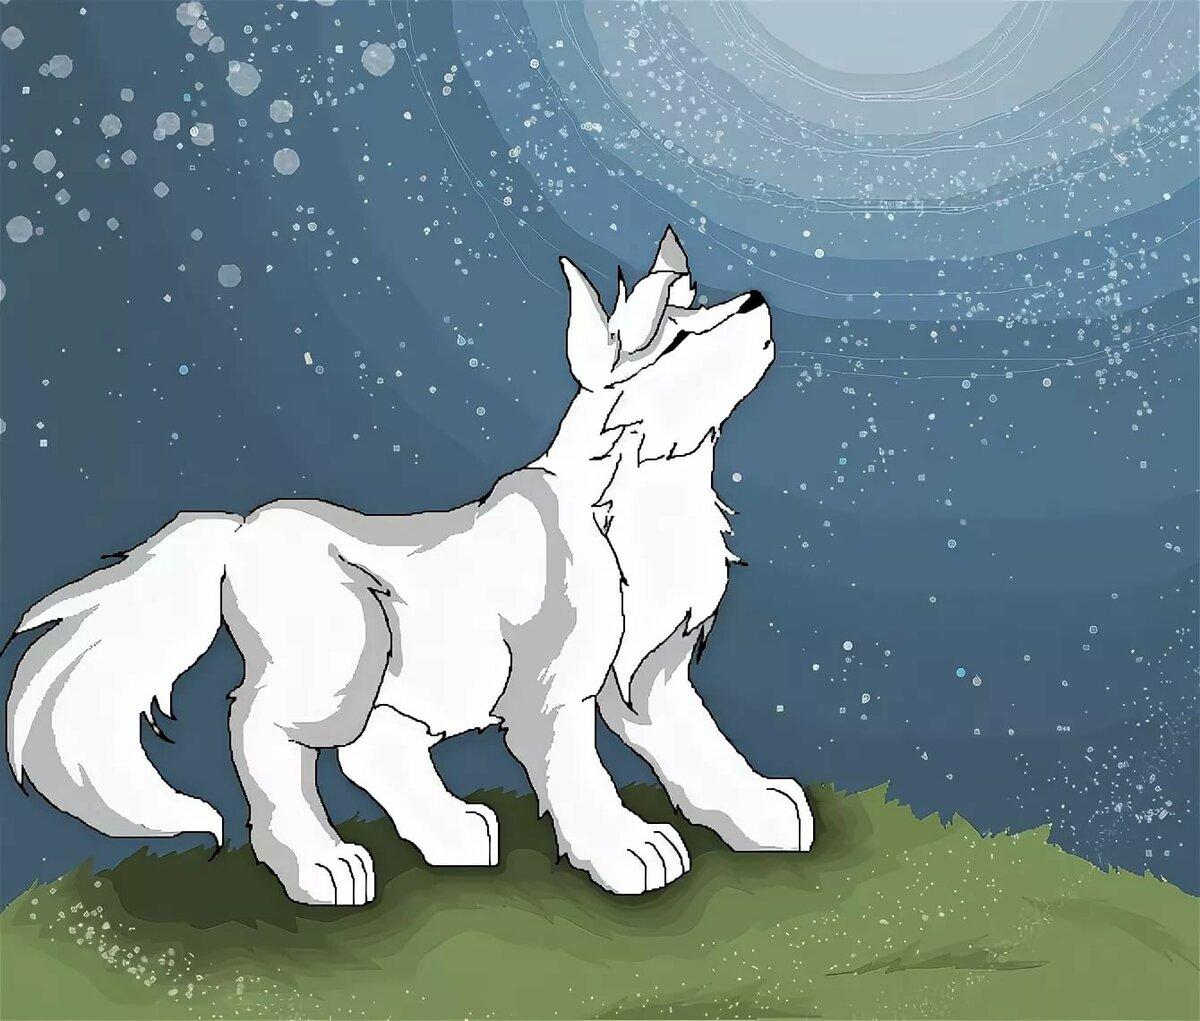 Картинки волка аниме на весь экран